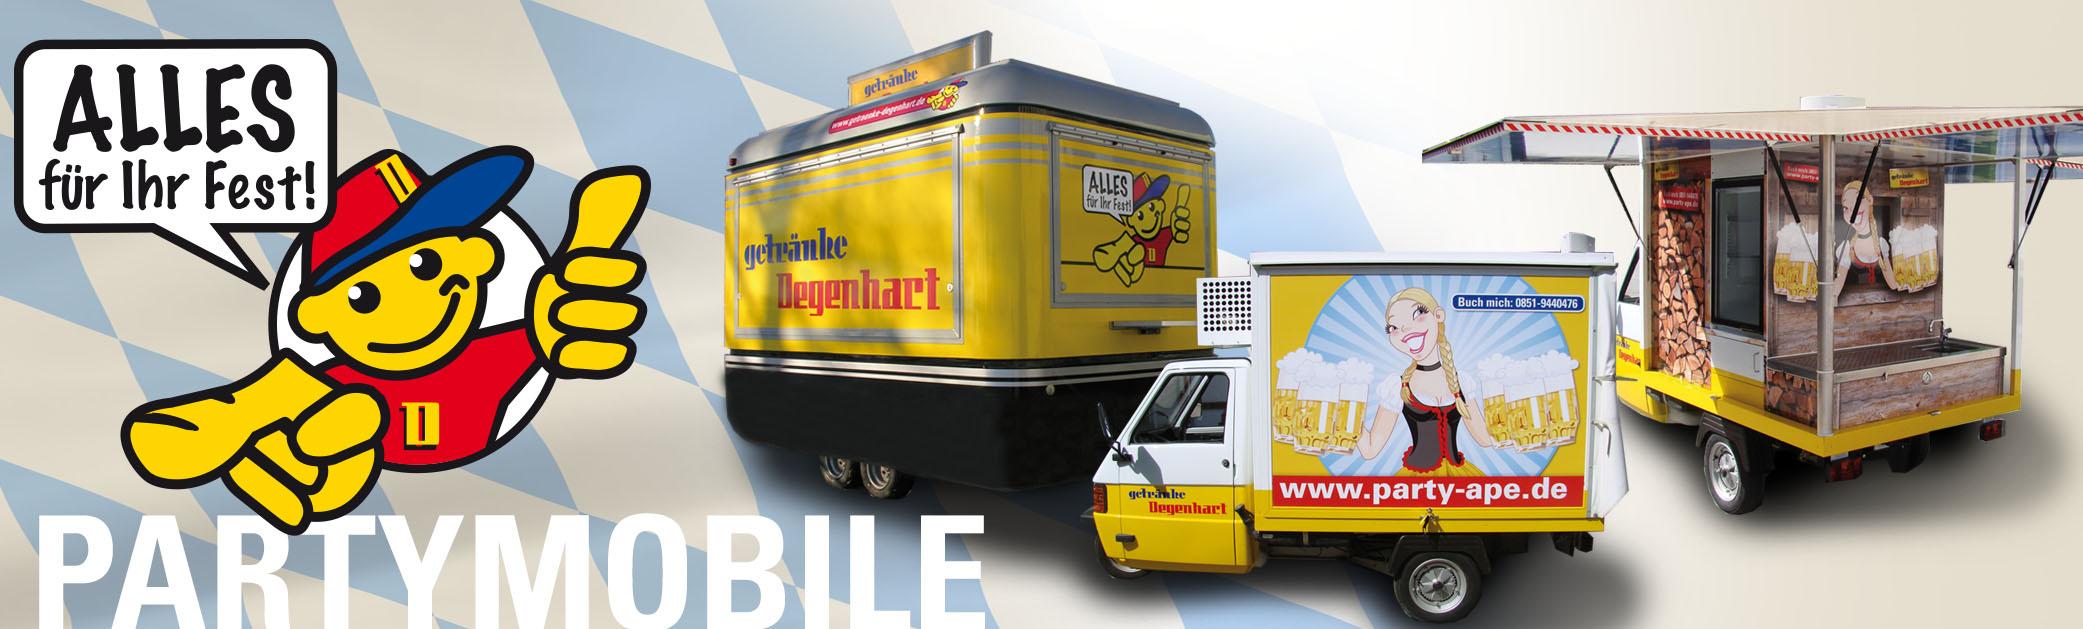 Getränke Degenhart - Getränke Degenhart Festservice Partymobile